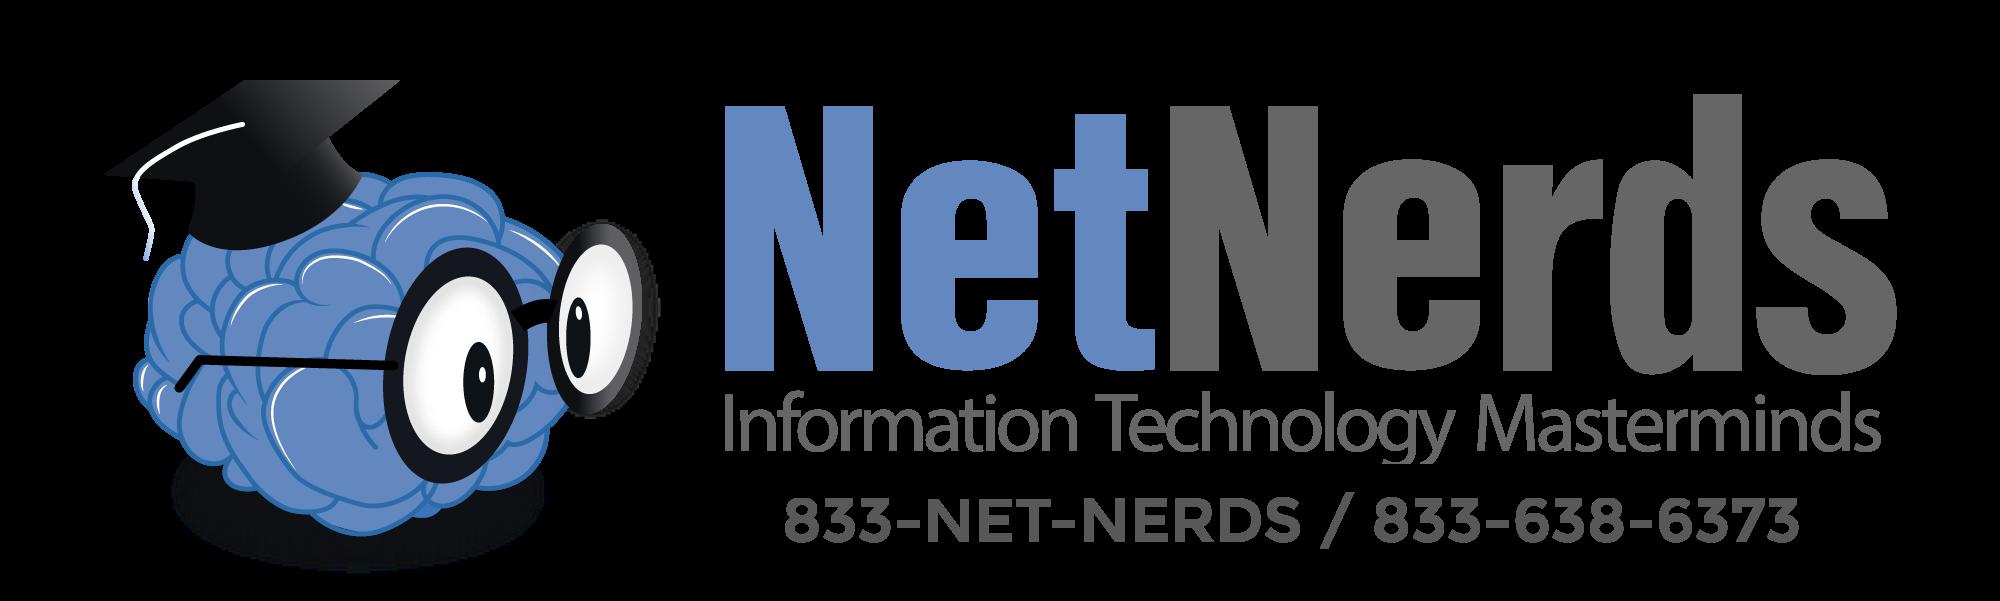 NetNerds.Com